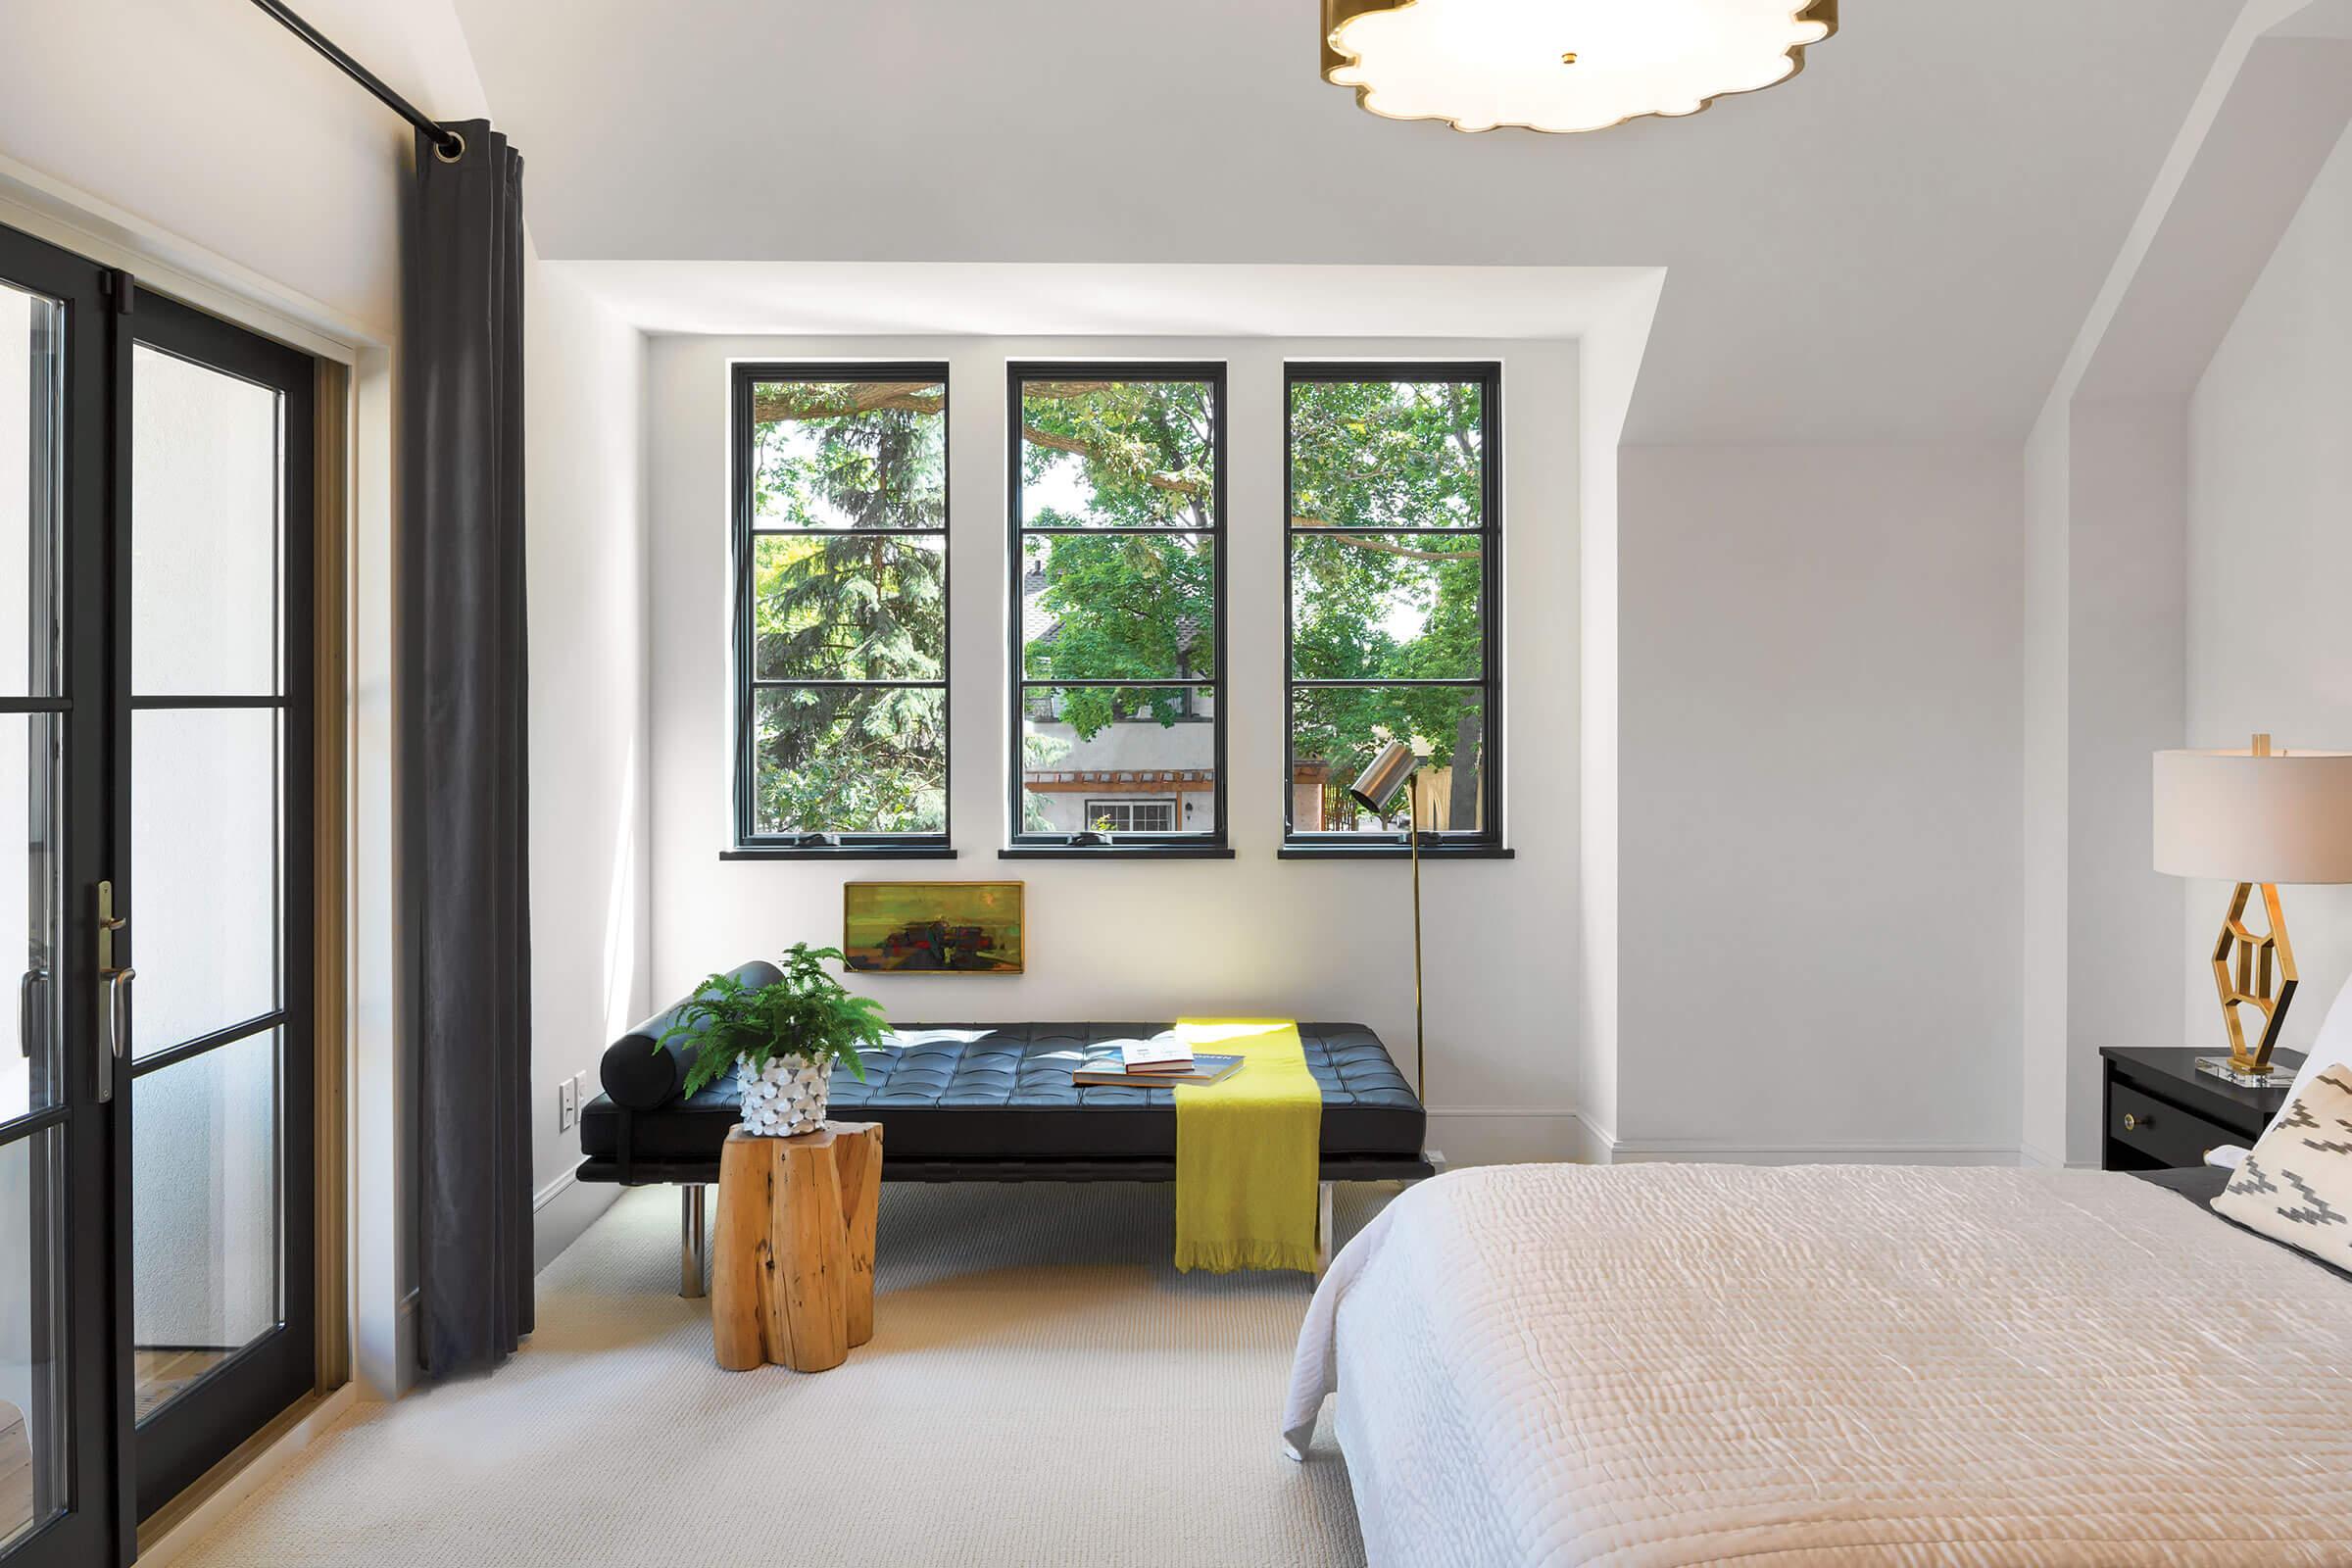 Wood-Fiberglass Casement Windows | Elevate Casement | Marvin